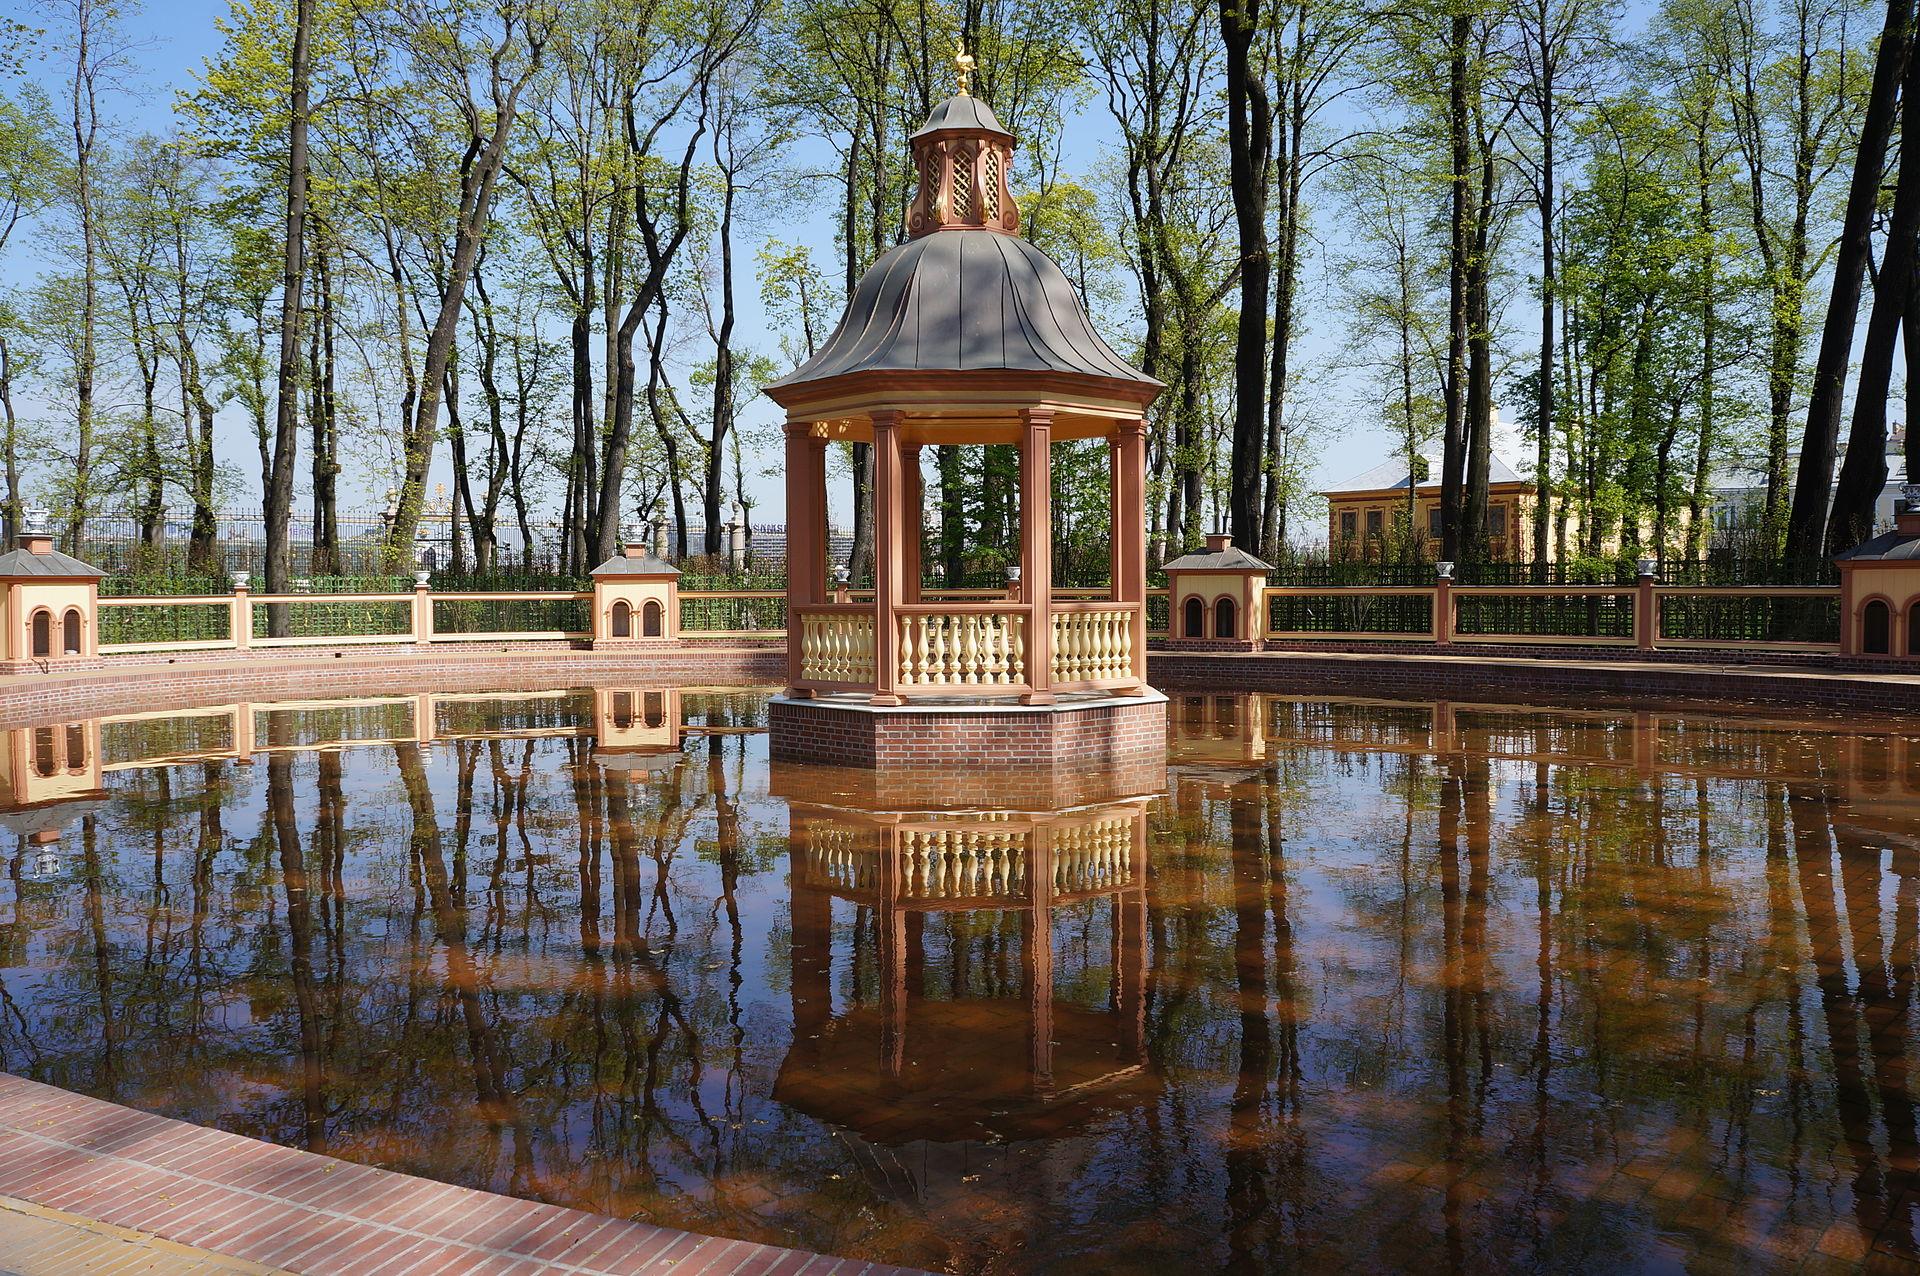 2012 г. Менажерийный пруд. Летний сад после реконструкции 2009-2011 гг. Автор фото: Евгений Со (Wikimedia Commons)